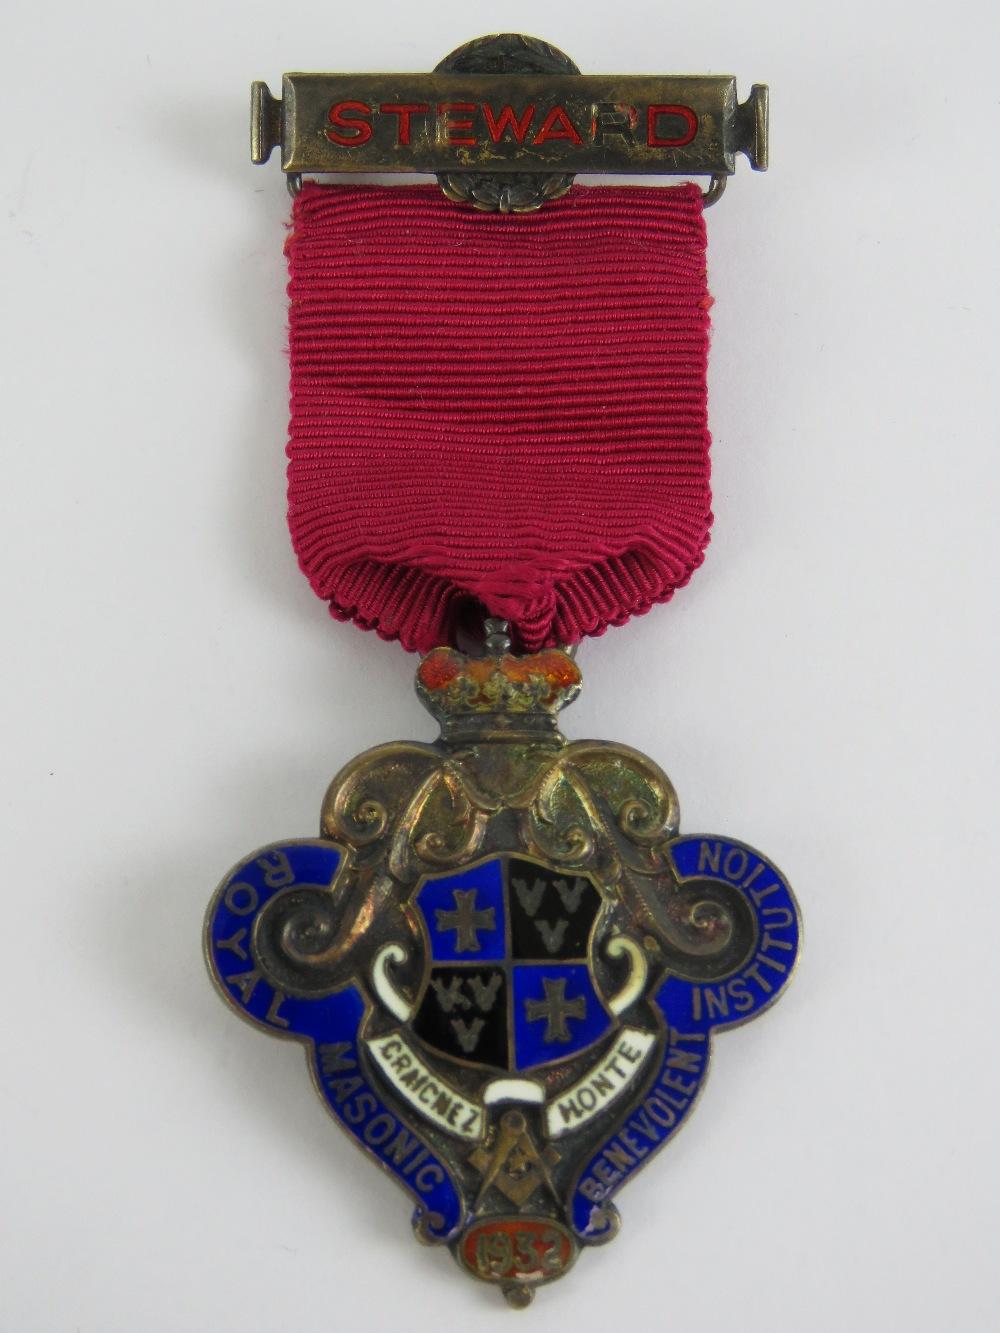 Lot 46 - Masonic; A Royal Masonic Benevolent Institution 1932 HM silver and enamelled jewel,